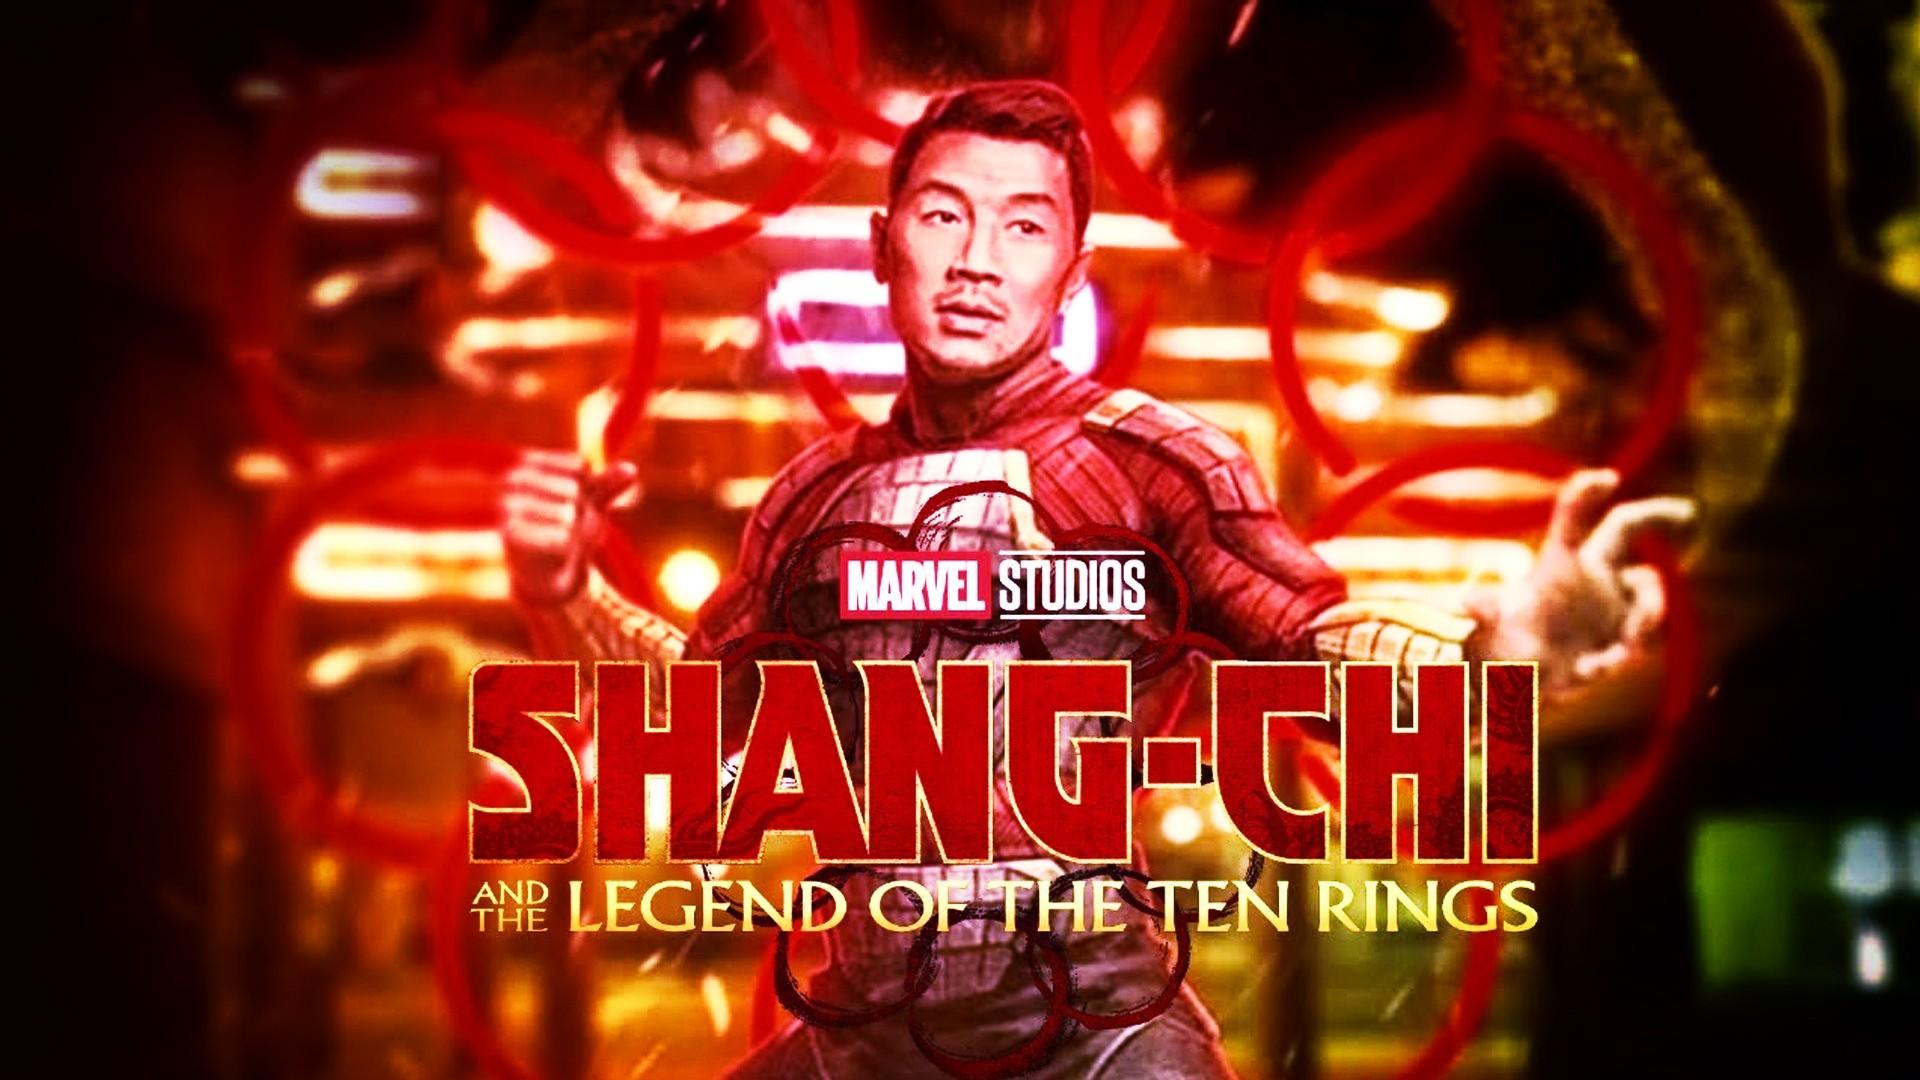 Shang Chi Ve 10 Yuzuk Efsanesi